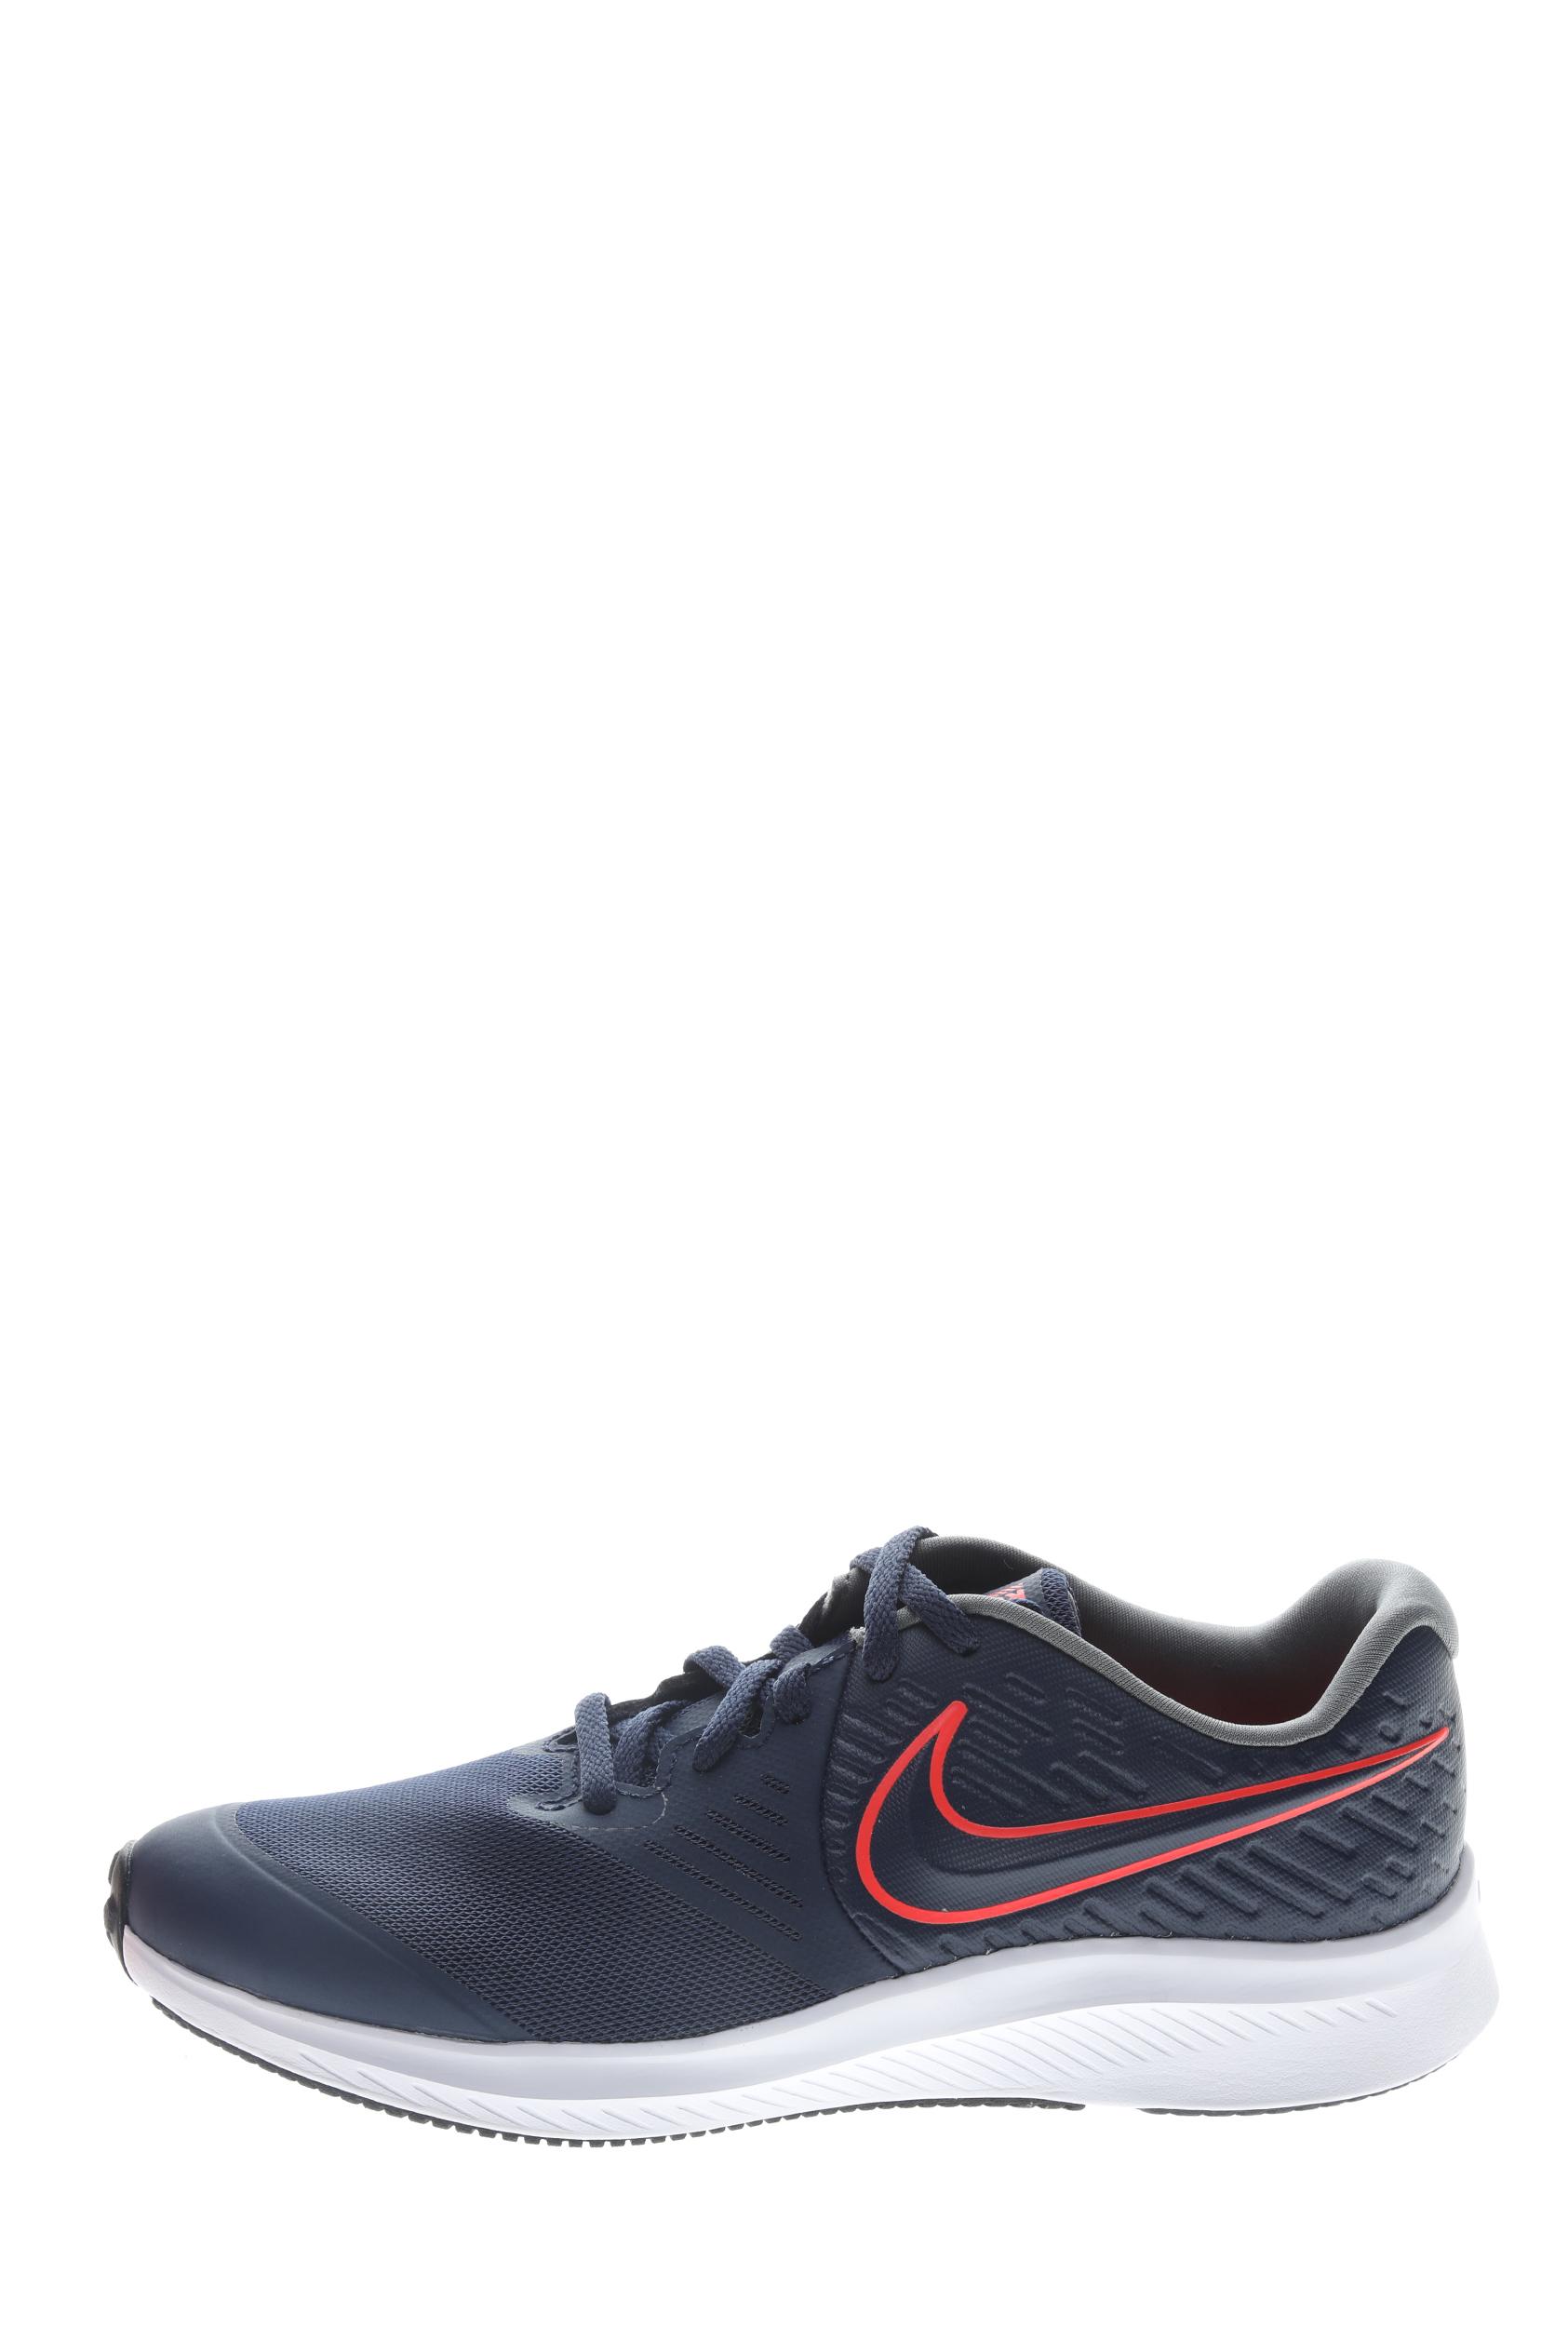 NIKE – Παιδικά παπούτσια running NIKE STAR RUNNER 2 (GS) μπλε